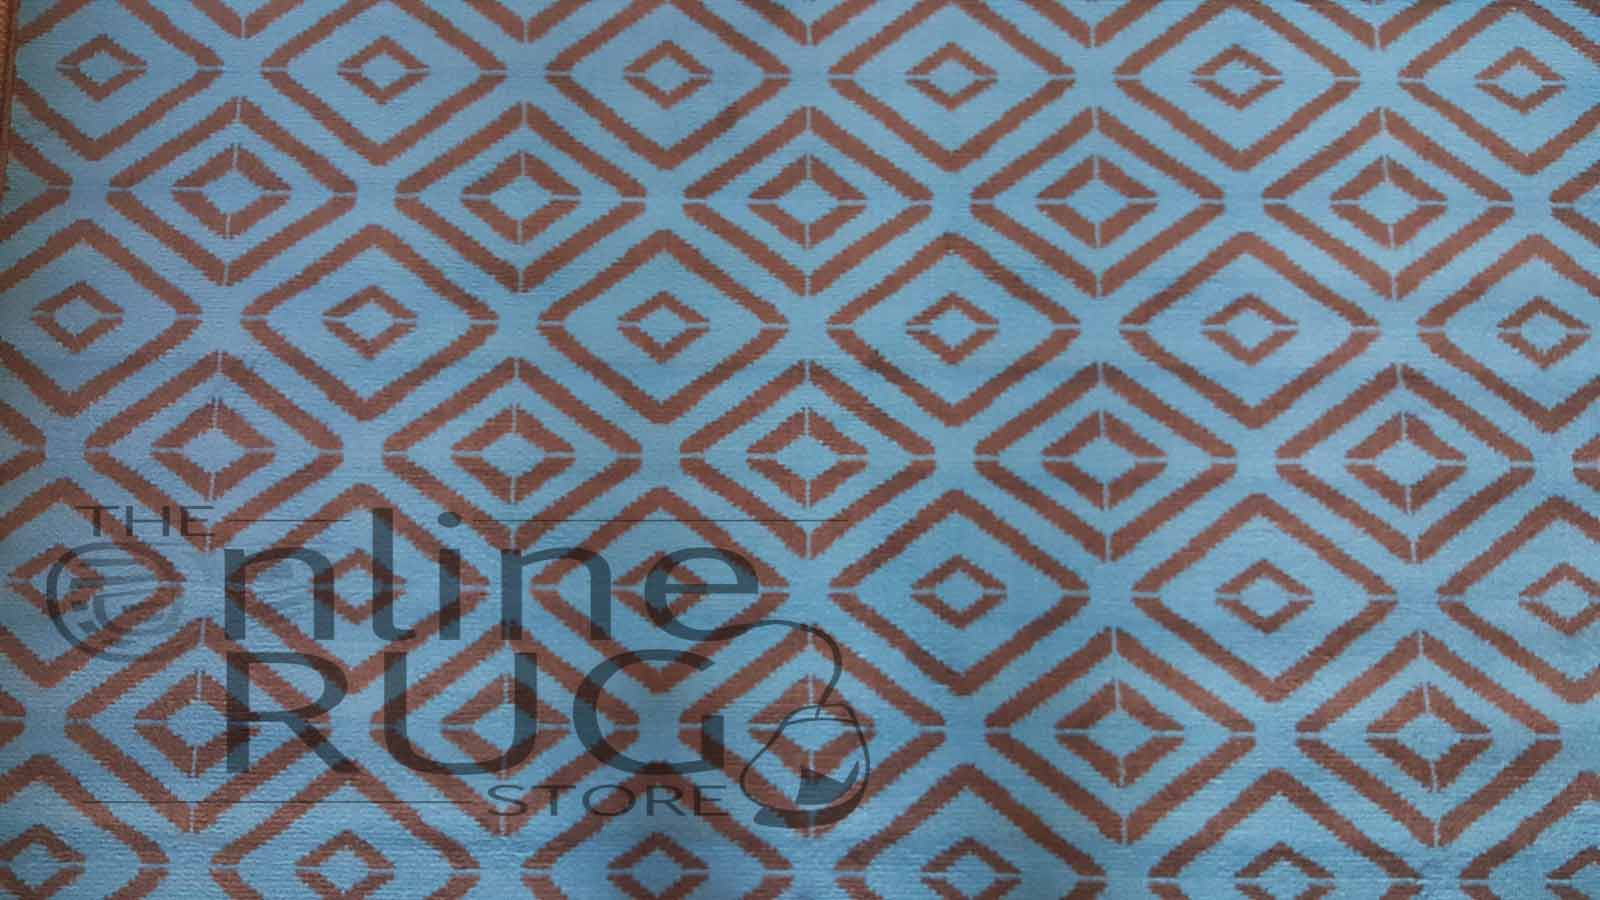 Studious Blue and Grey Geometric Diamond